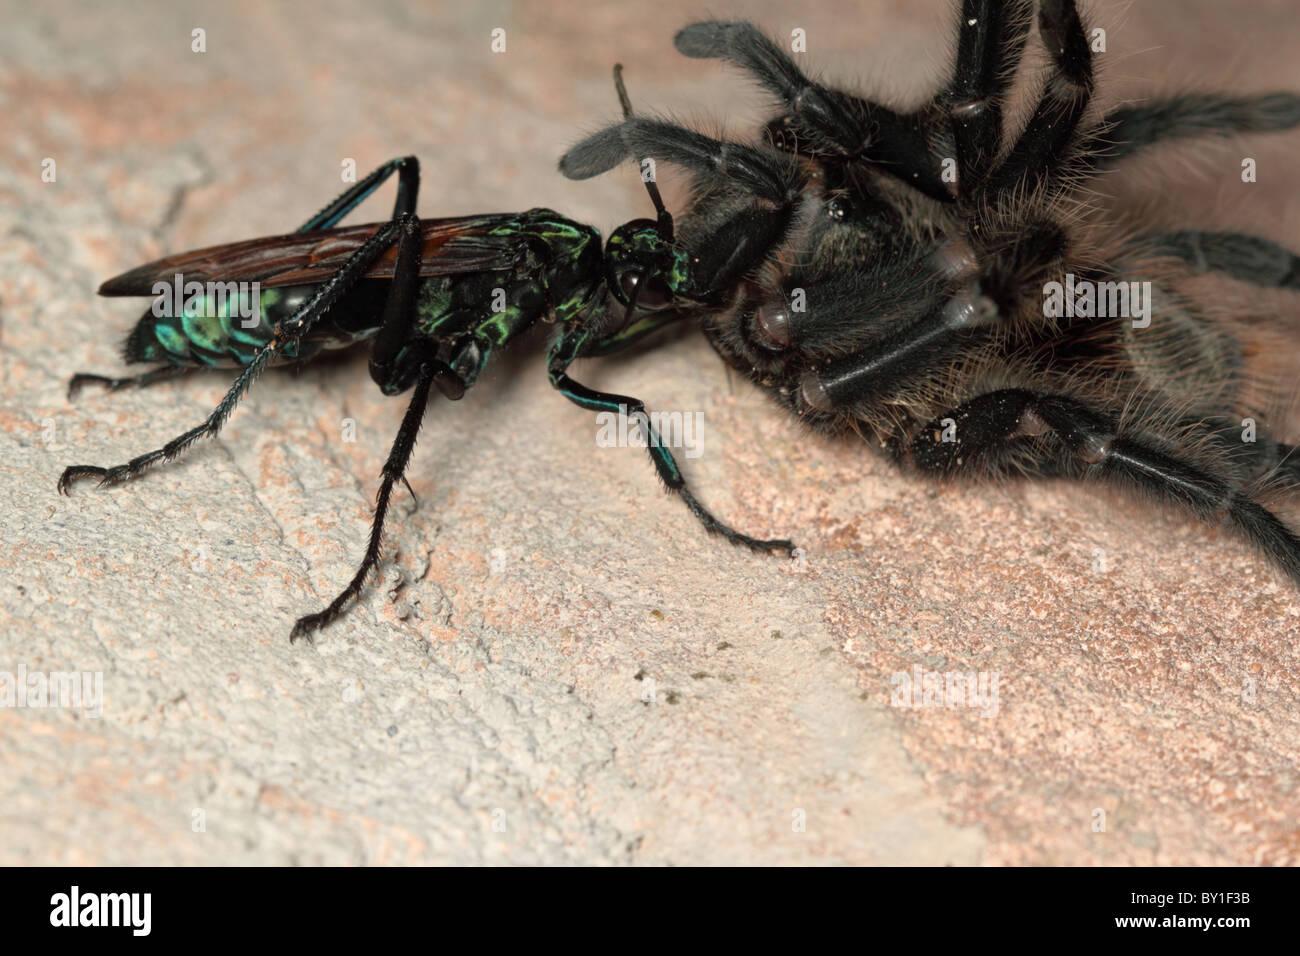 tarantula hawk wespe ziehen eine riesige spinne stockfoto bild 33839887 alamy. Black Bedroom Furniture Sets. Home Design Ideas